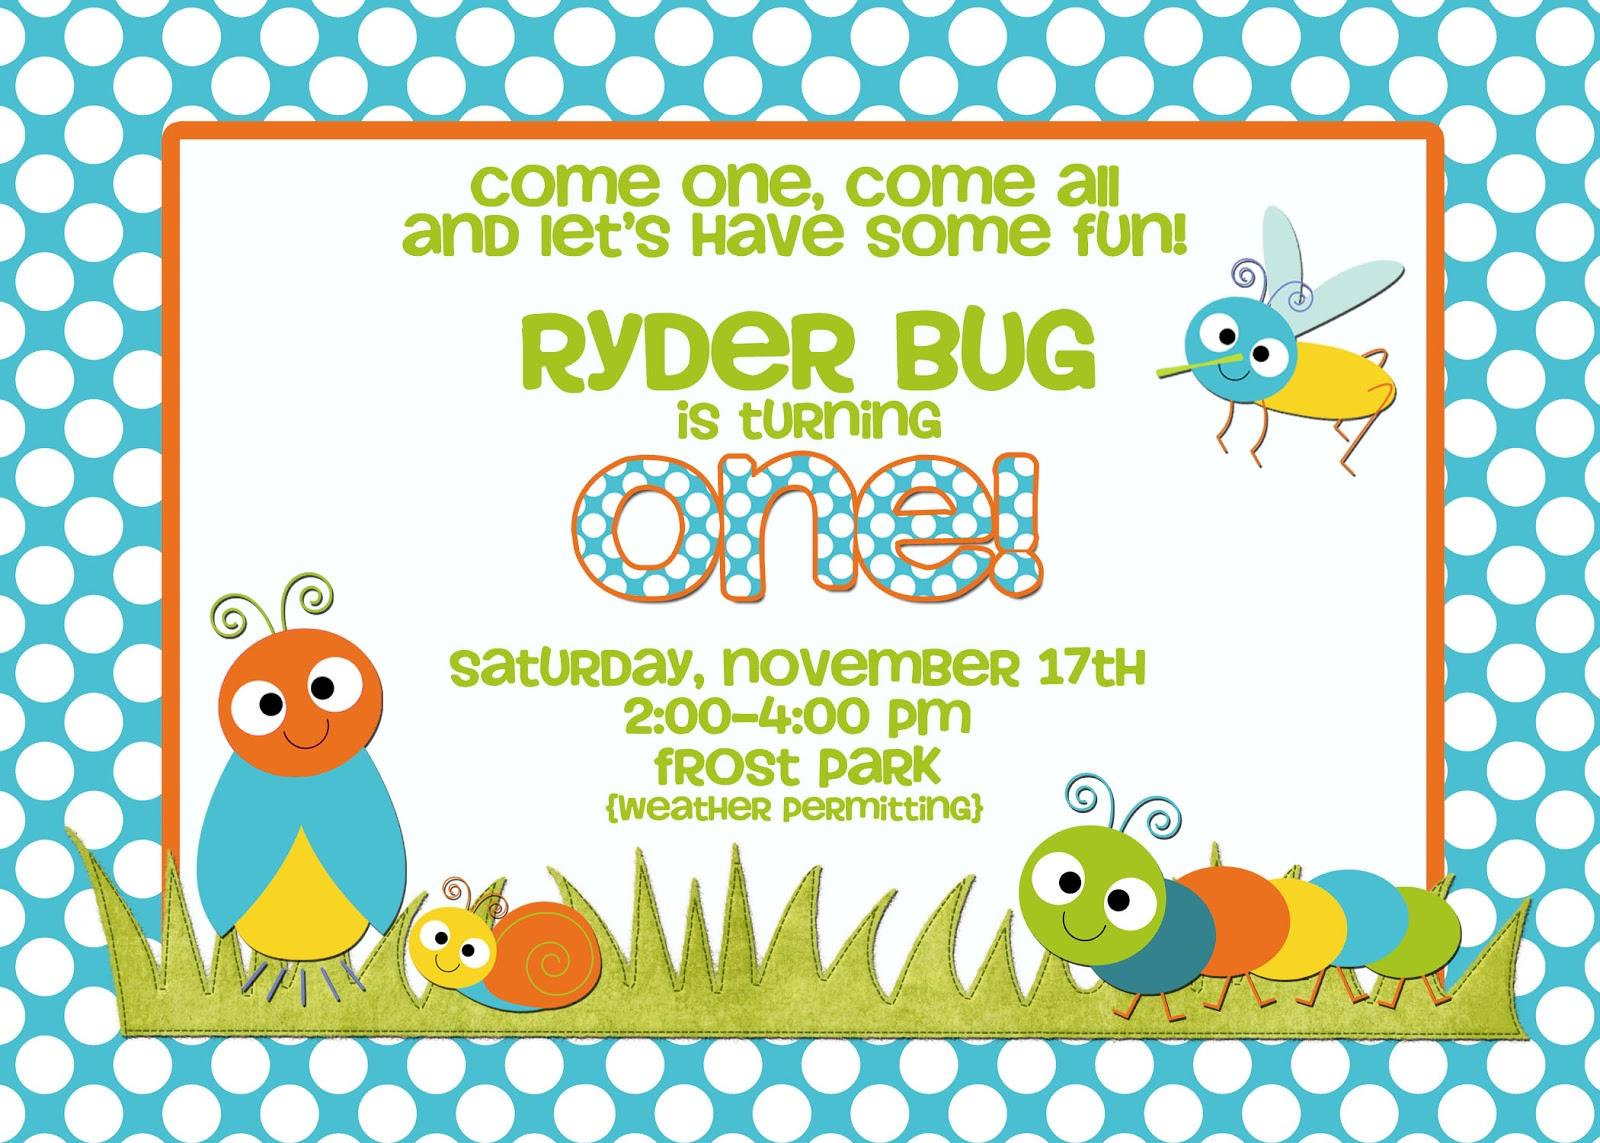 Bug Birthday Invitations Image collections - Invitation Templates ...